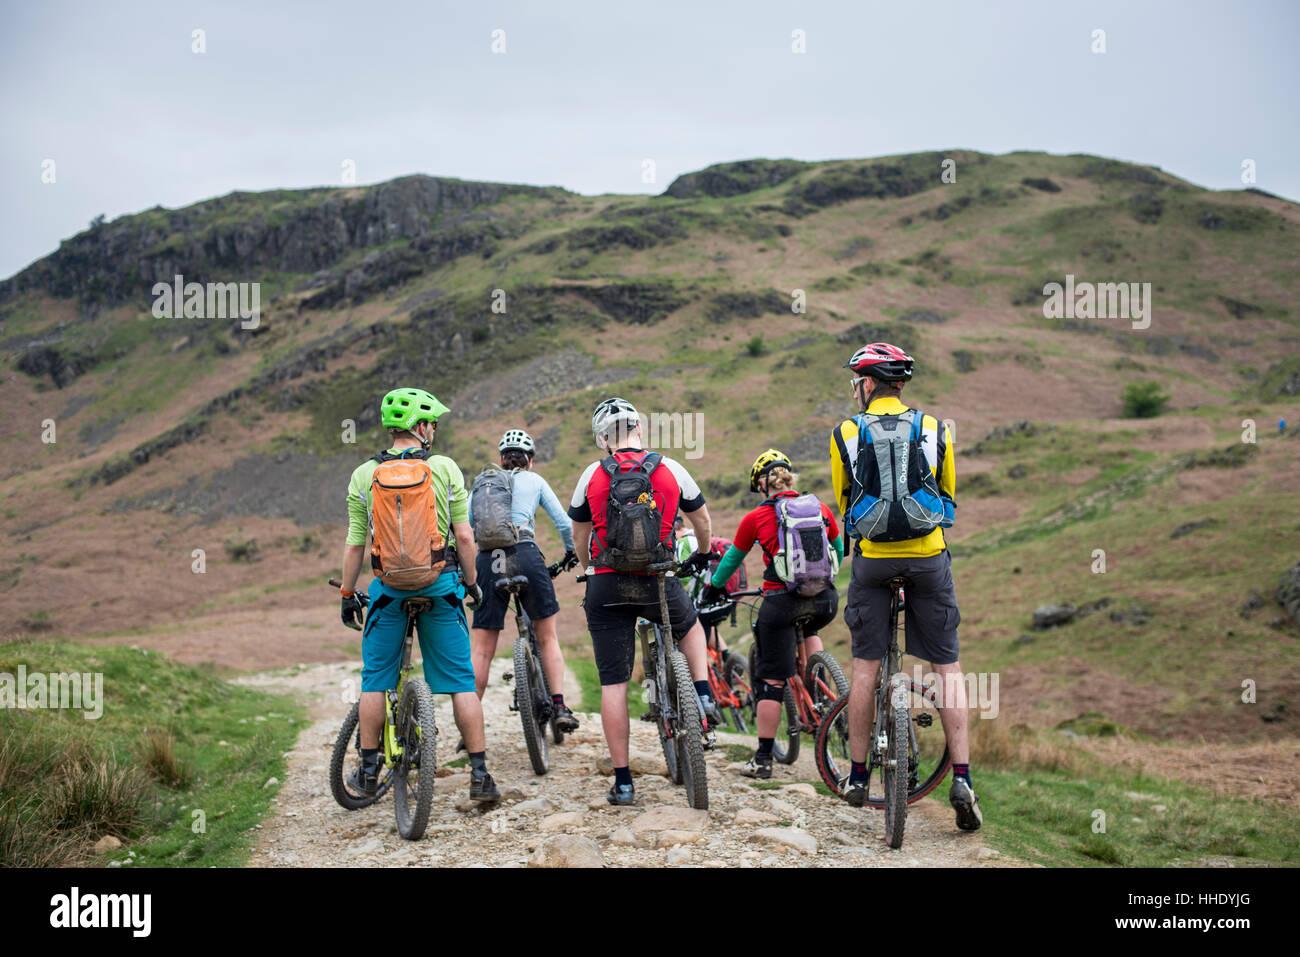 Mountainbiker stoppen, um ihre Route durch Loughrigg fiel in Lake District National Park, Cumbria, England zu betrachten Stockbild